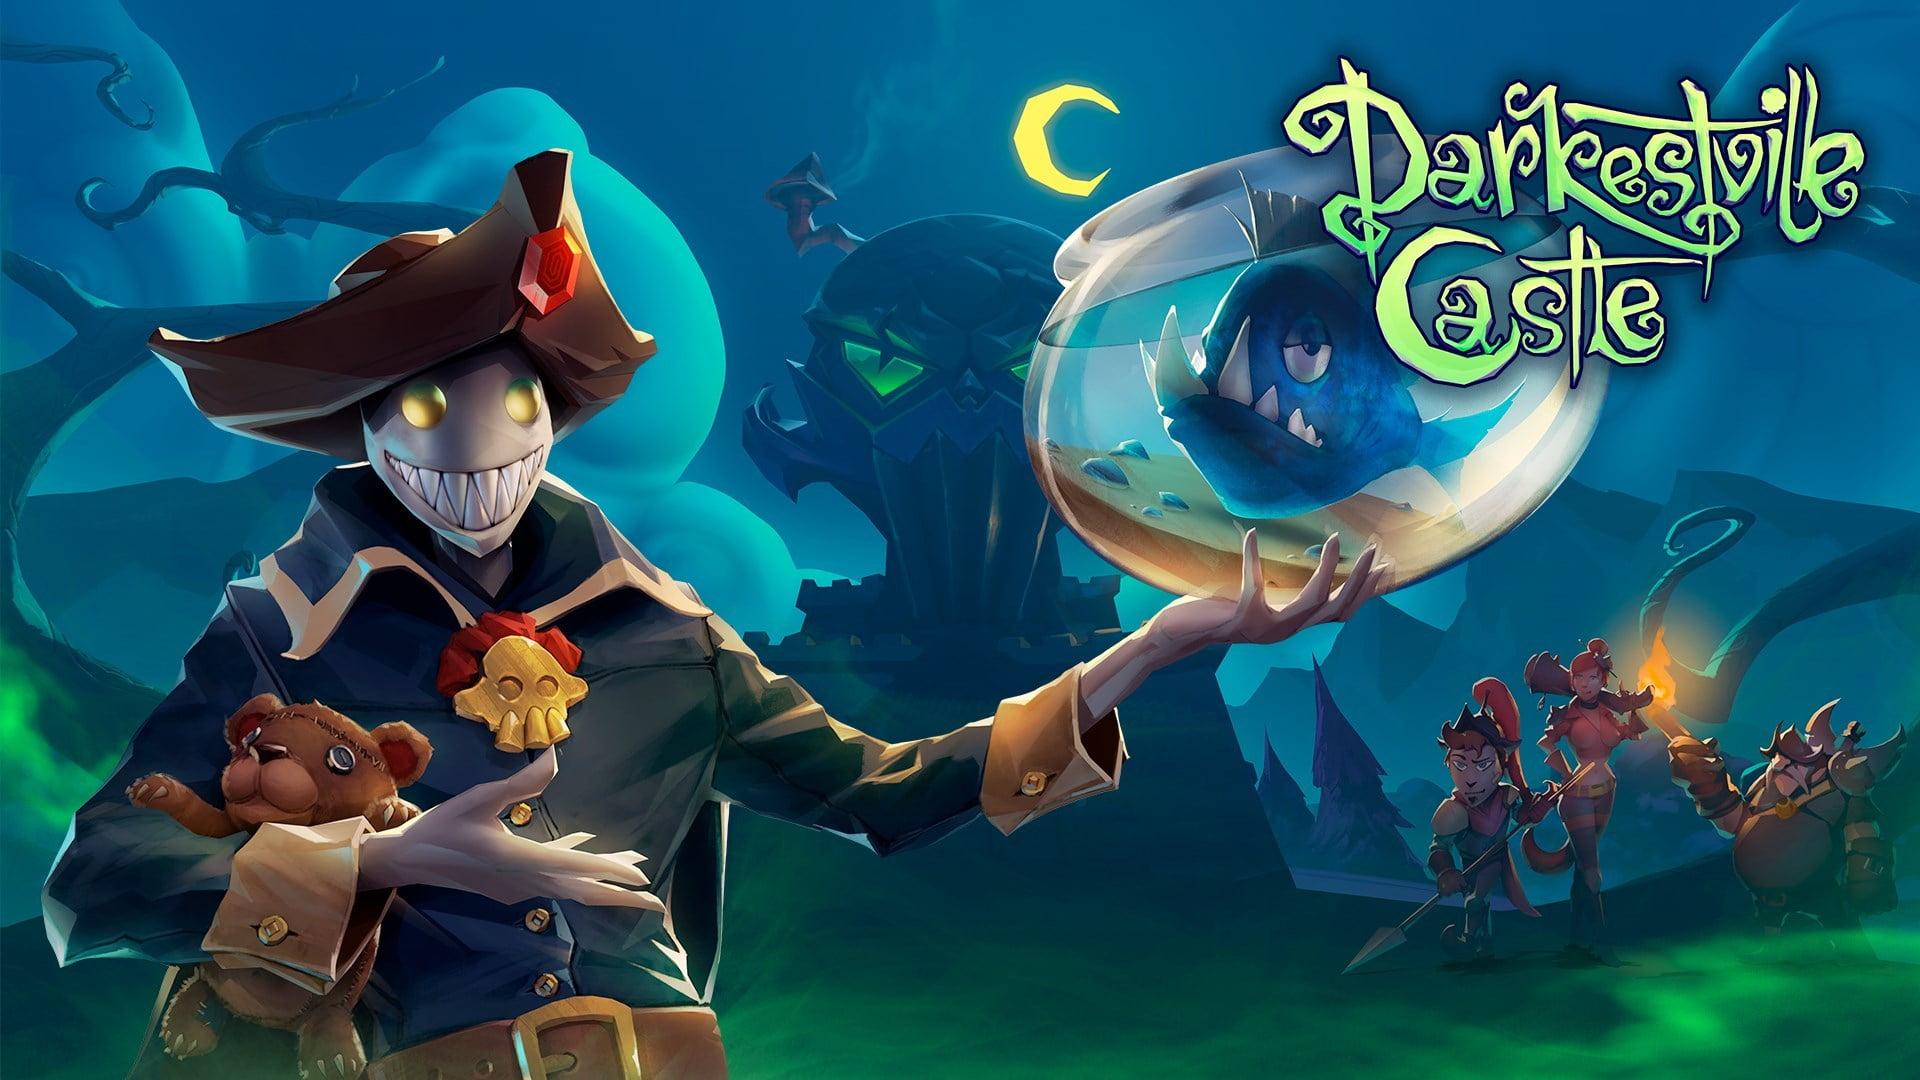 Darkestville Castle Review